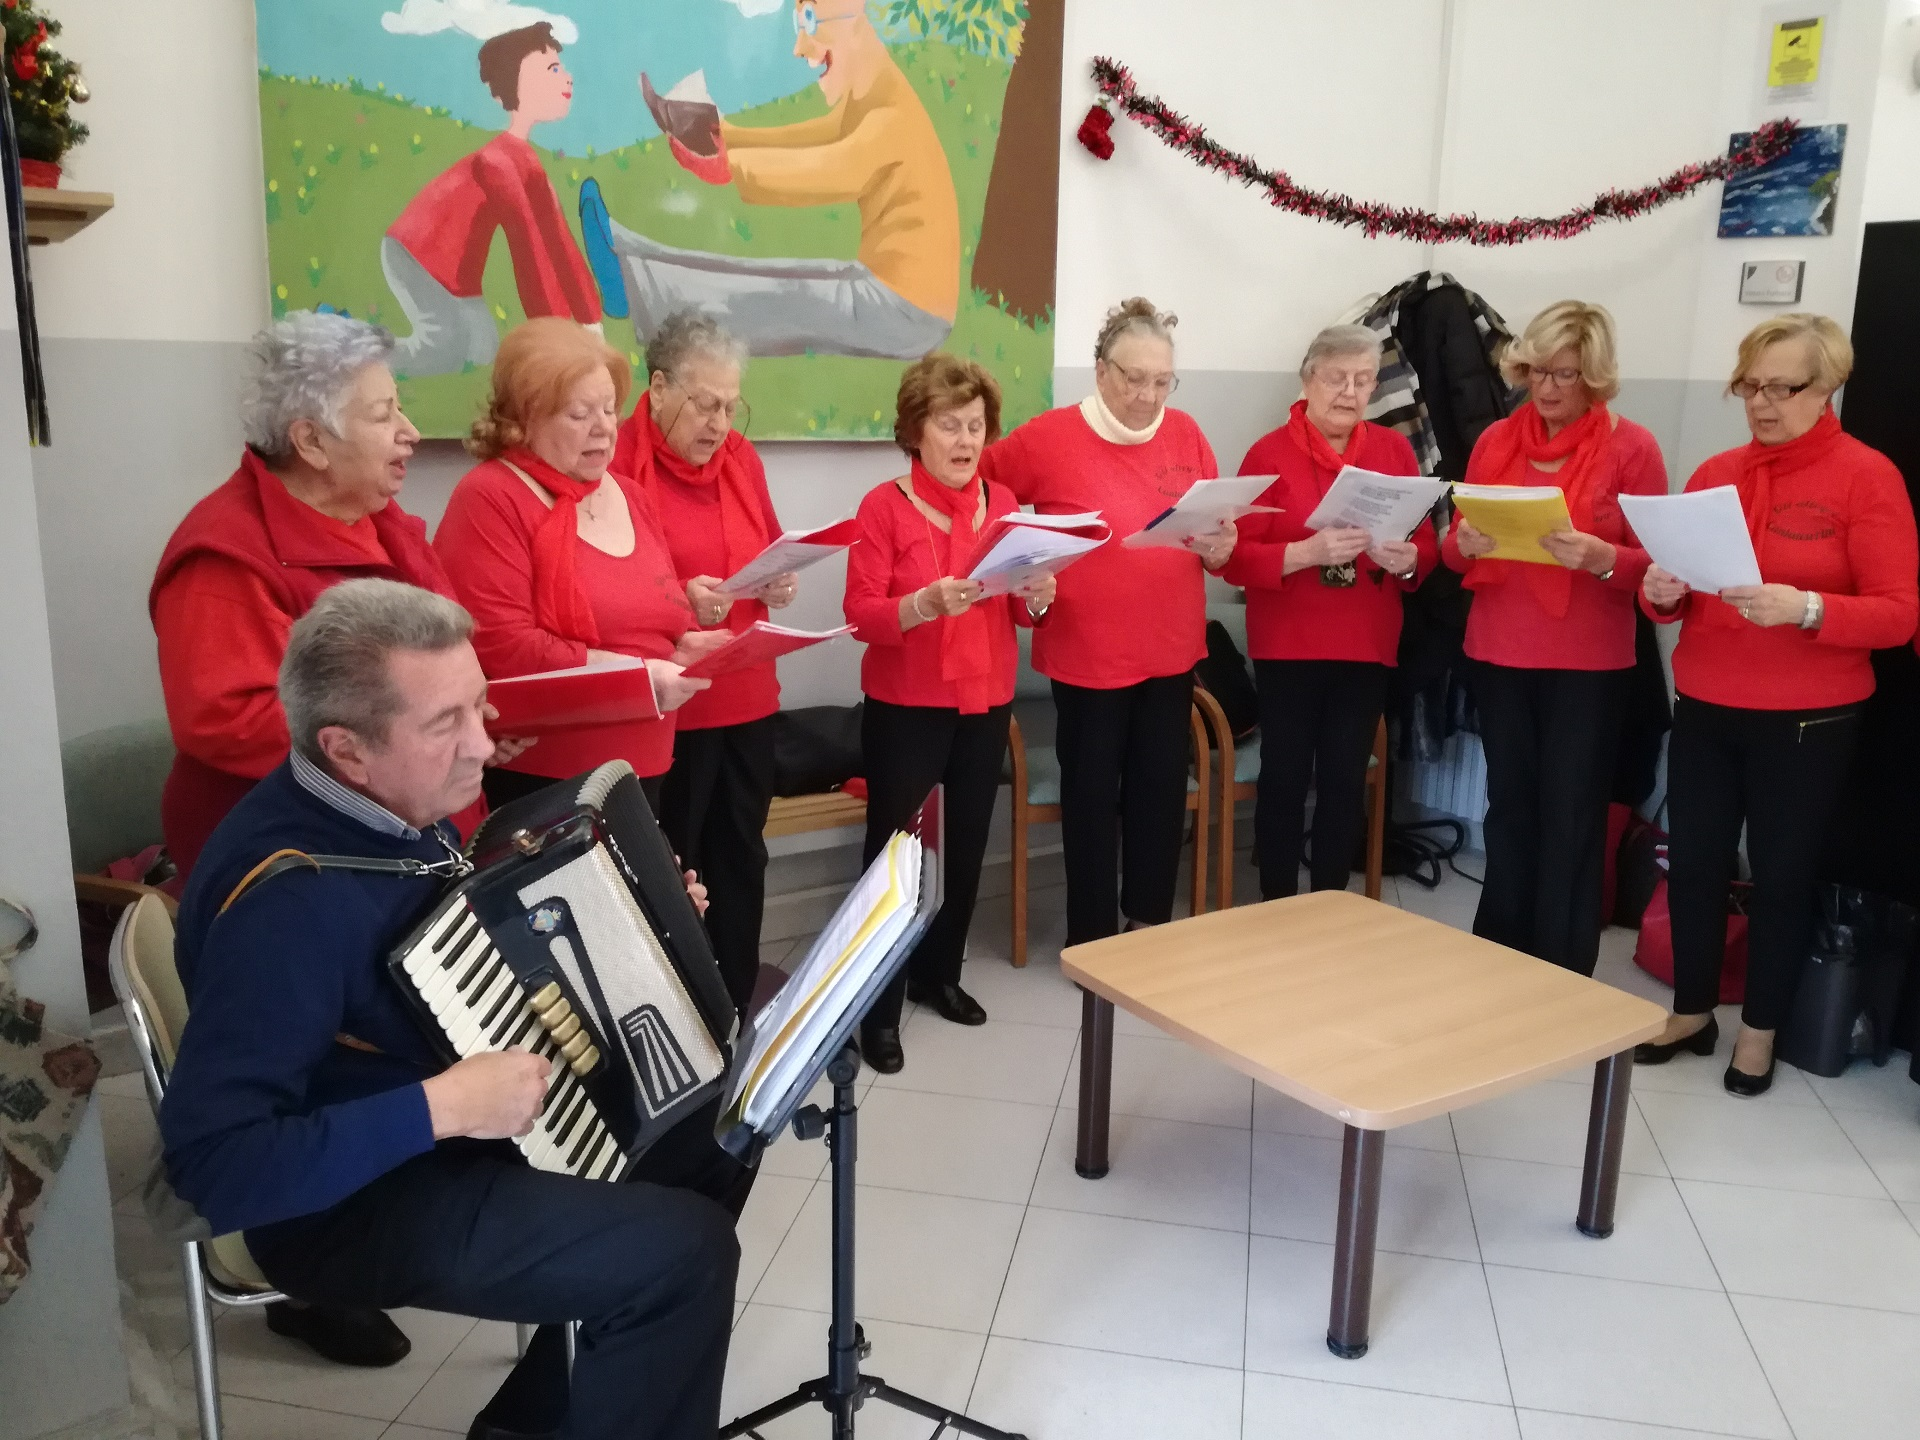 Festa Natale 2019 Residenza Sanitaria Assistenziale Noceti - Opere Sociali Servizi Savona